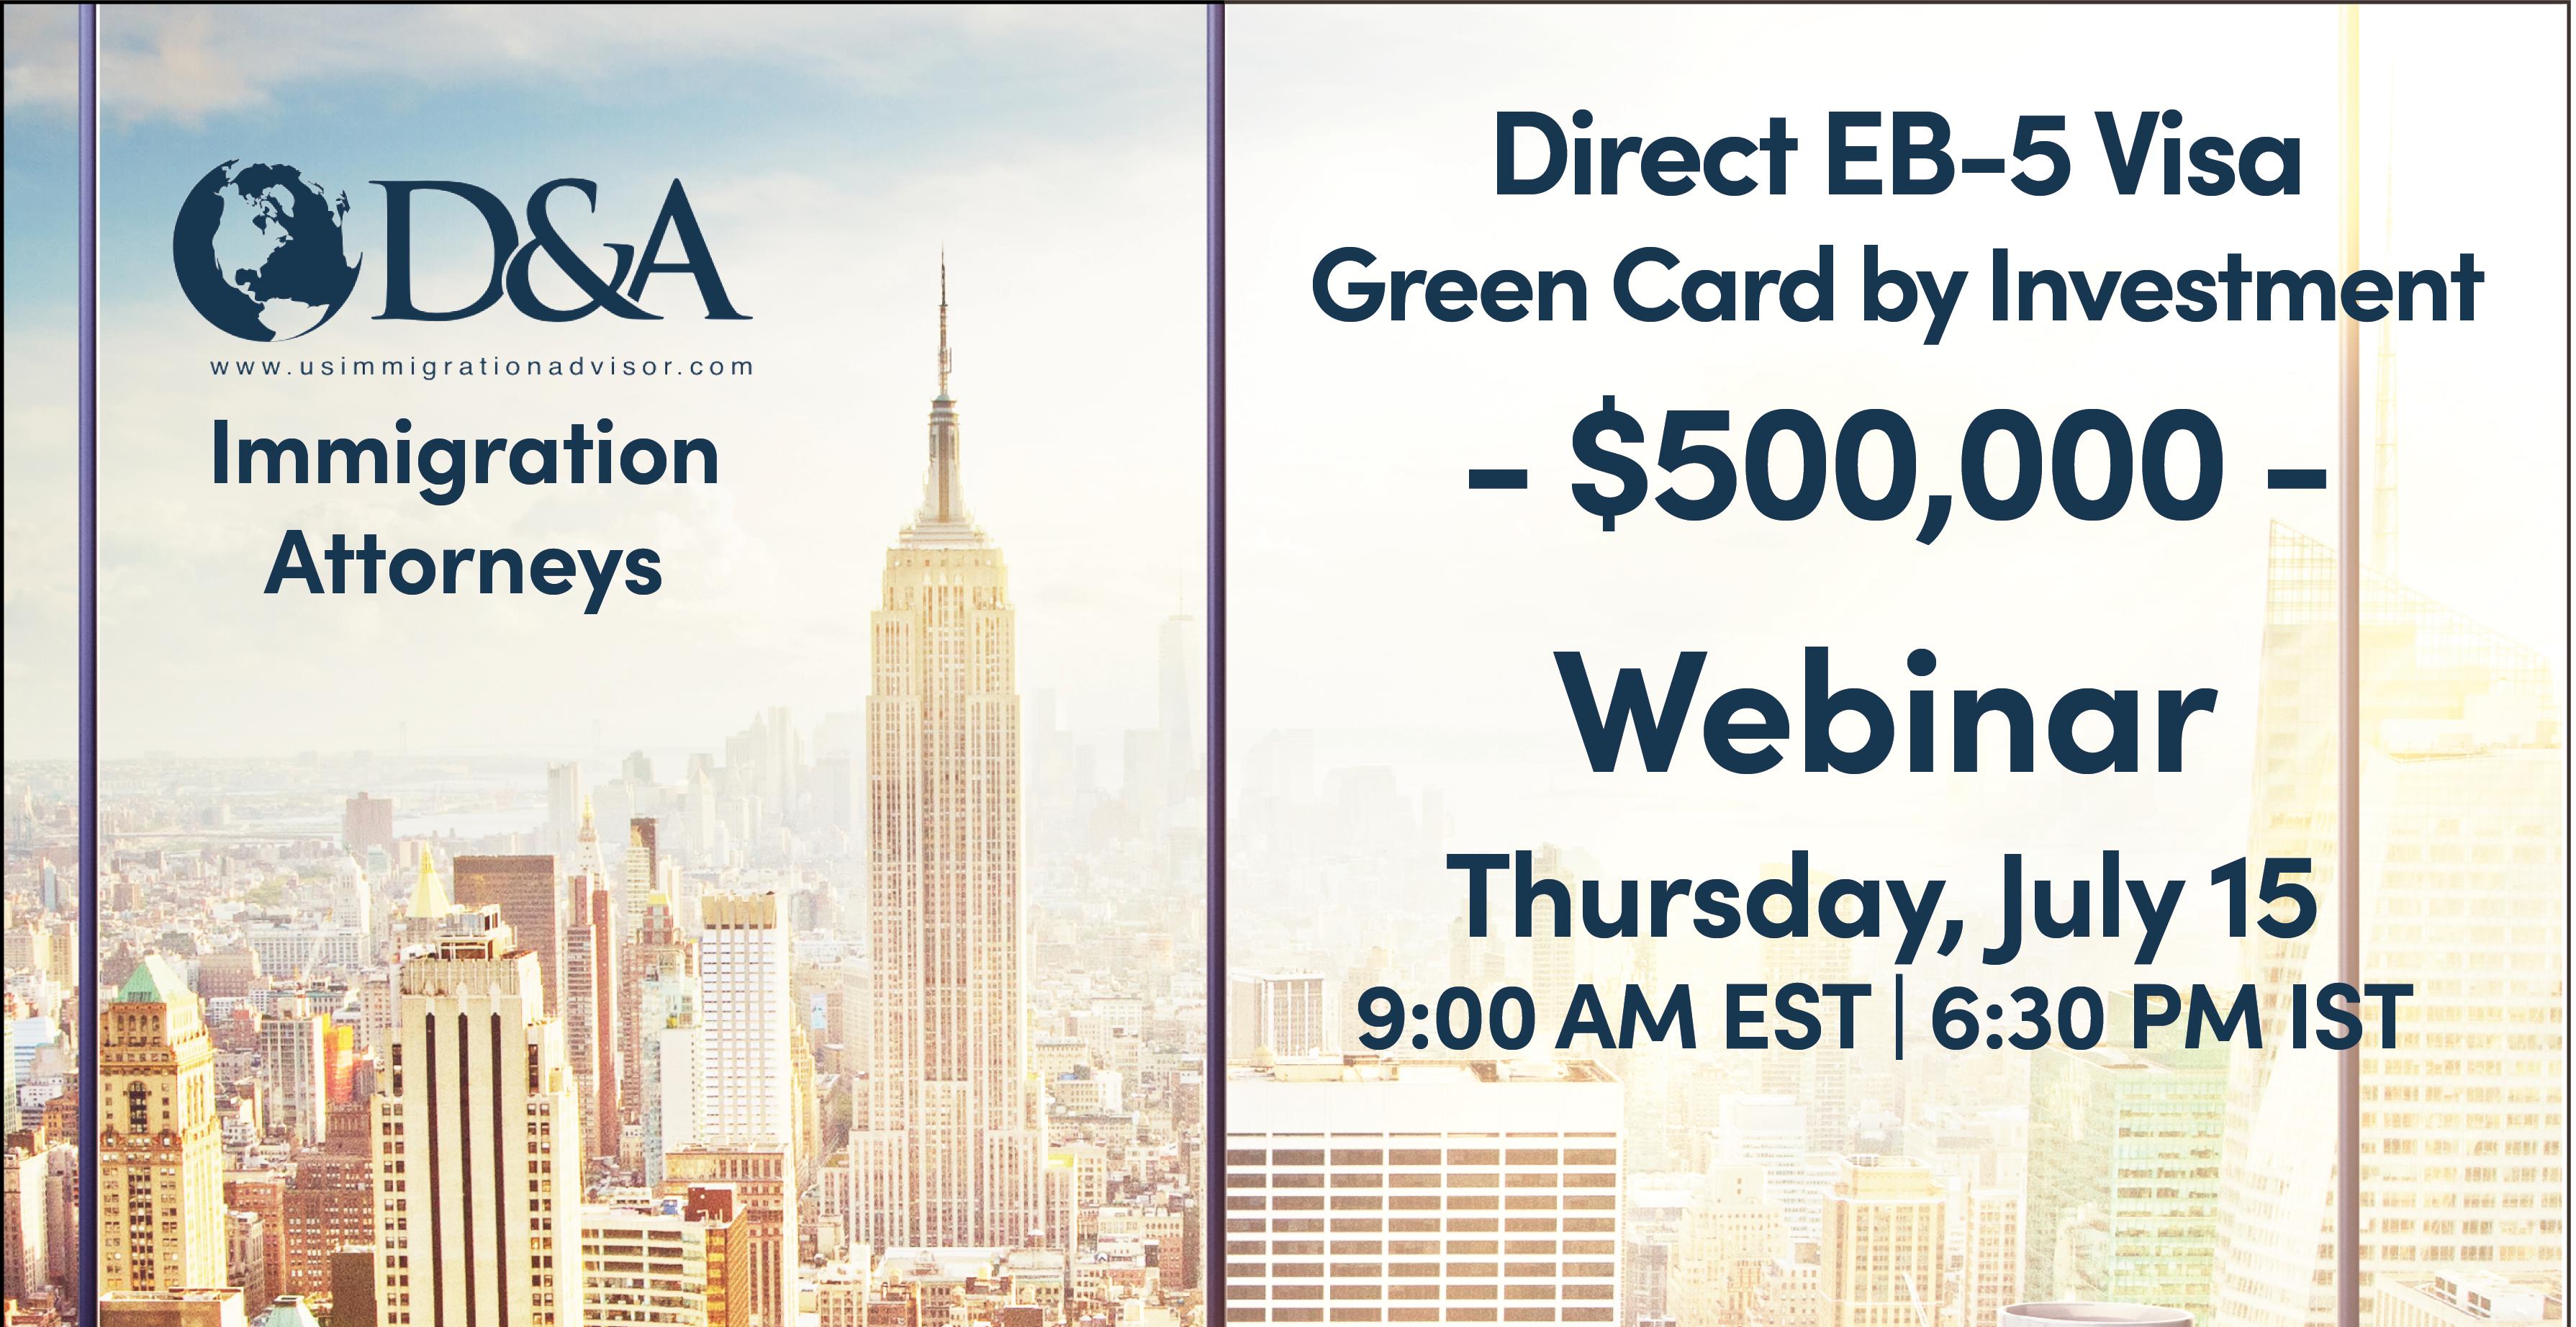 Webinar on Direct EB-5 Visa for Green Cards